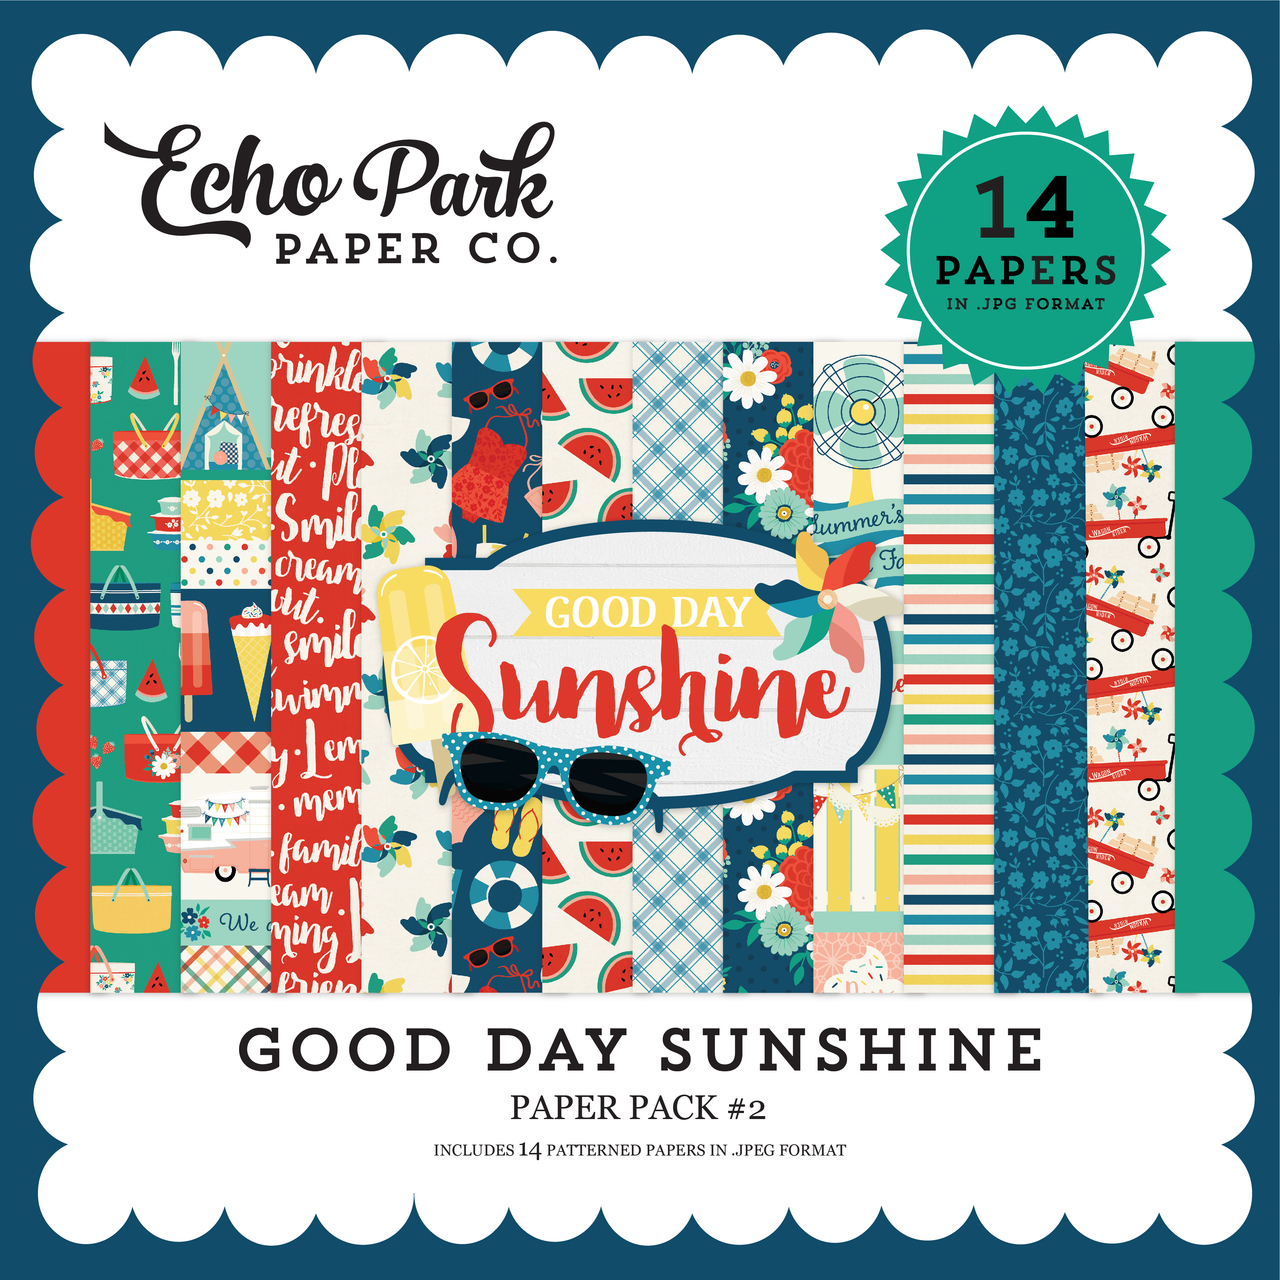 Good Day Sunshine Paper Pack #2